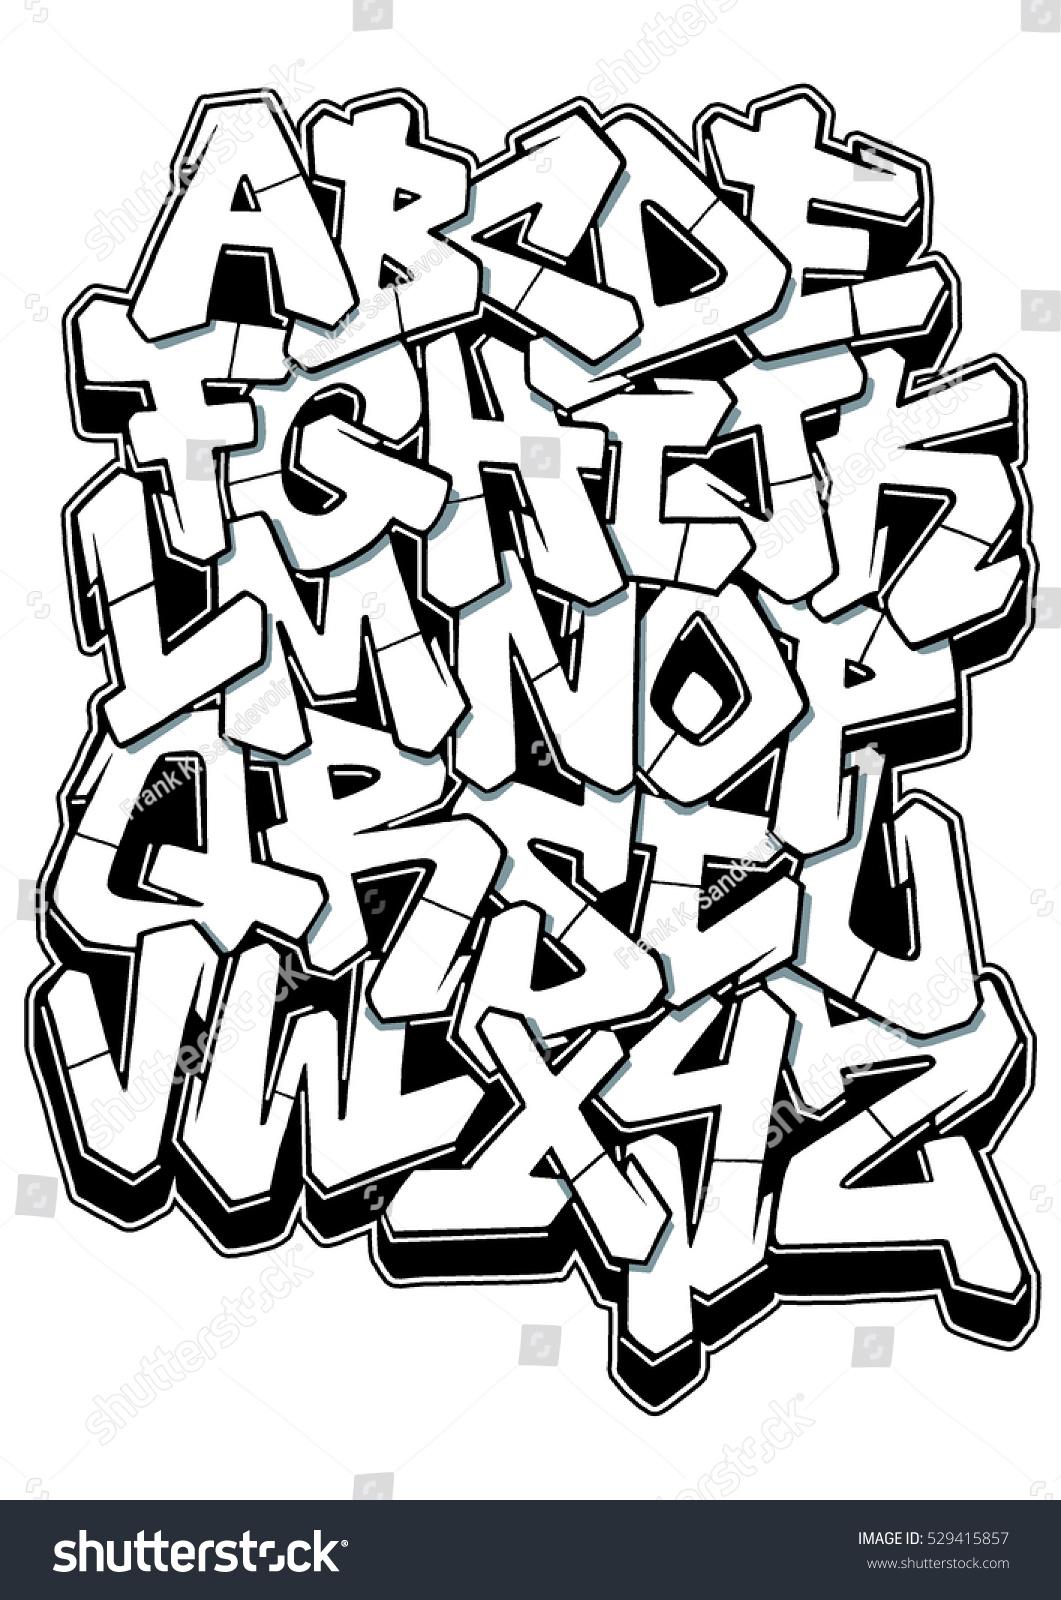 Graffiti Letters Sketch Alphabet 02